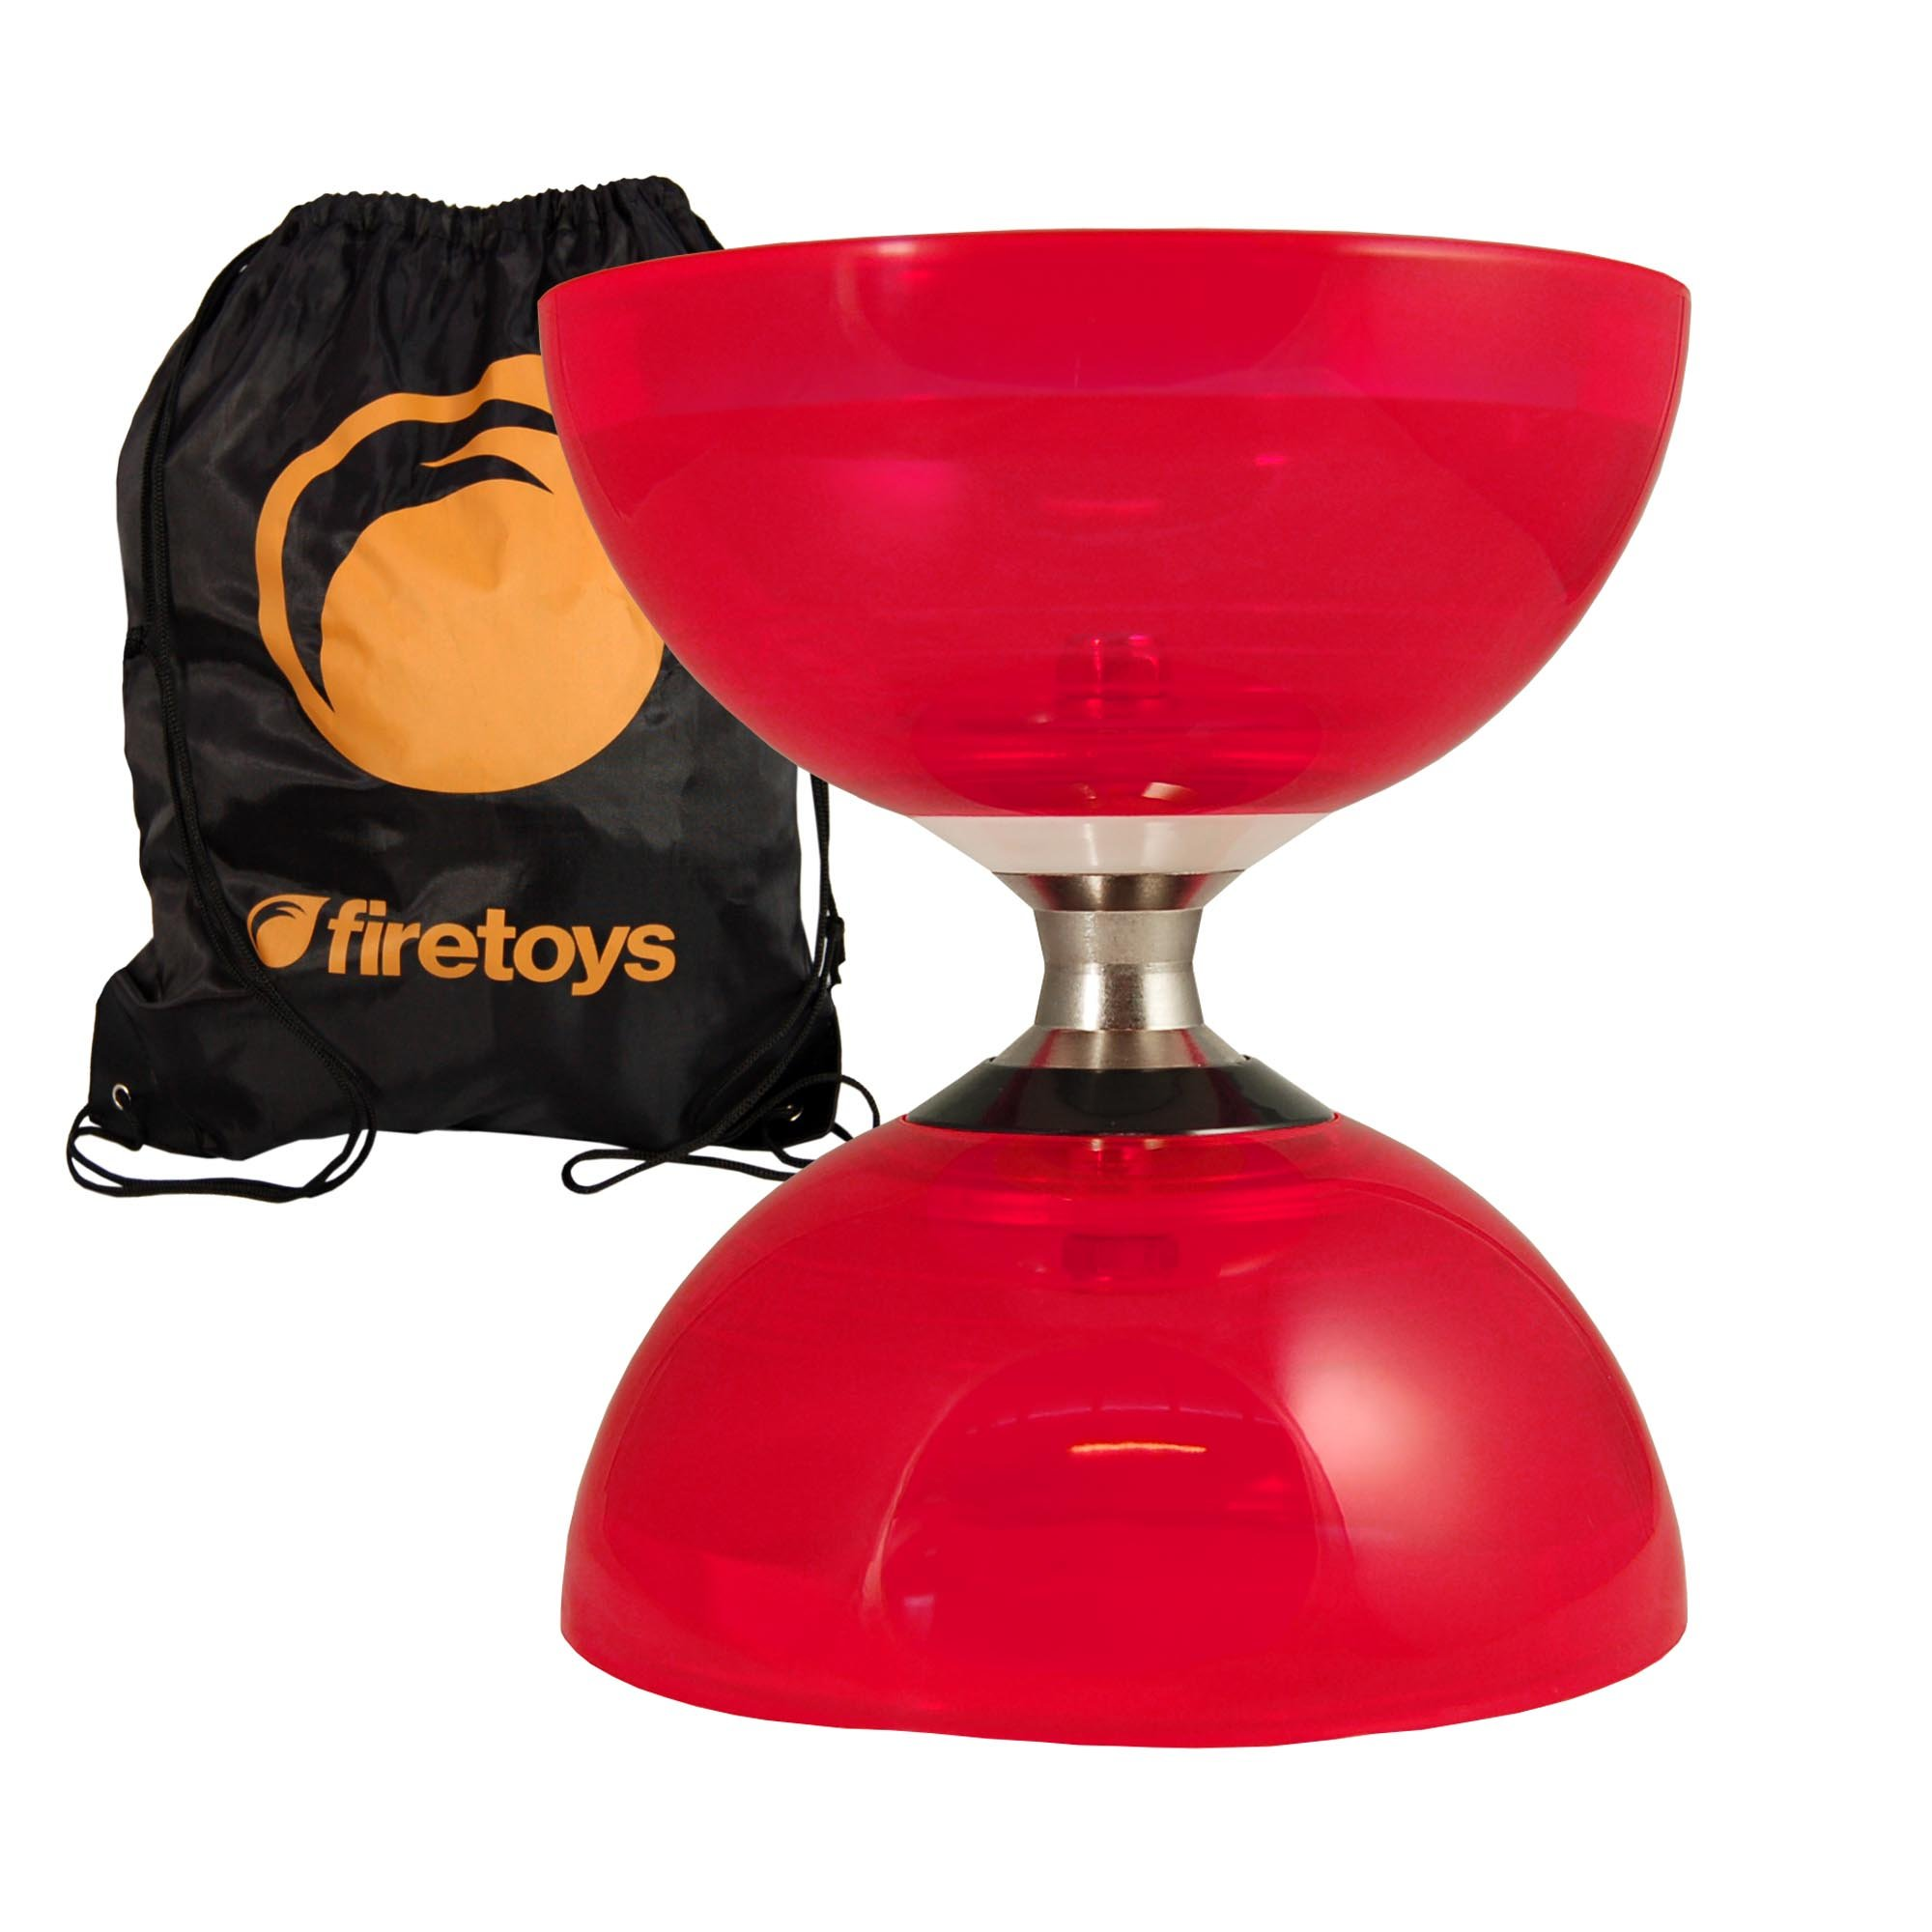 Cyclone Quartz 2 (Red) Triple Bearing Diabolo & Firetoys Bag - No Diablo Sticks or String